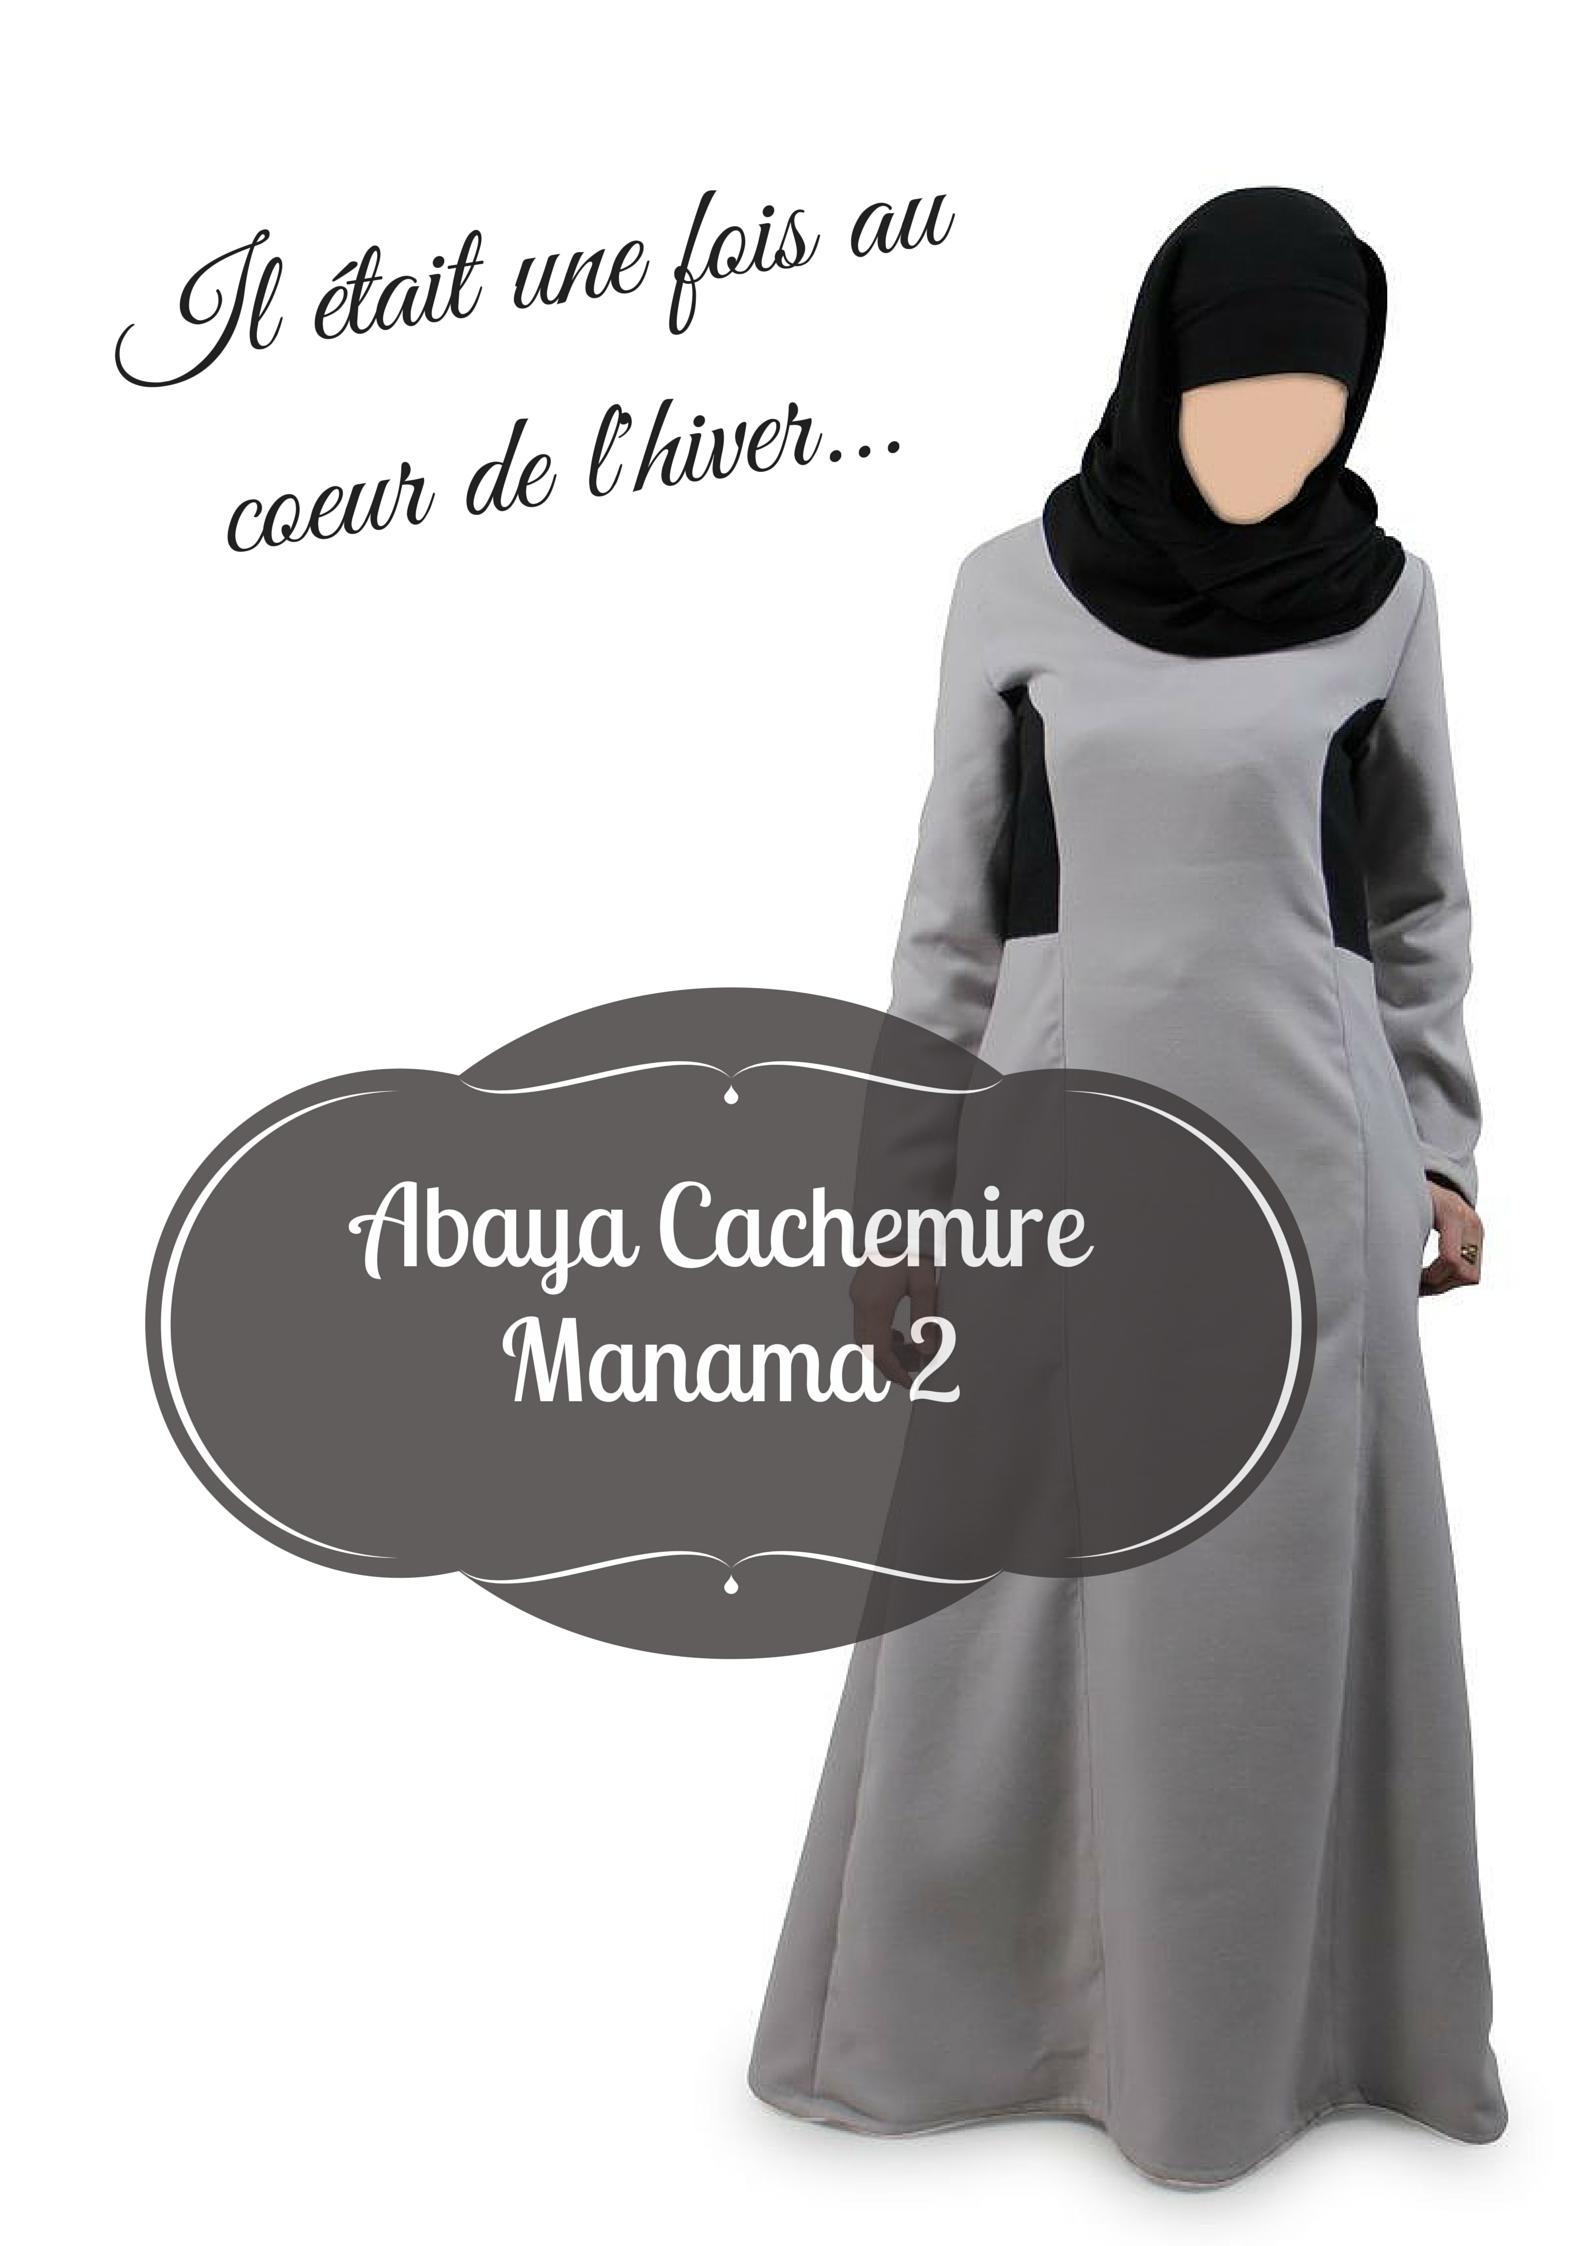 2f9a8a31b2f Abaya Cachemire Manama 2 Al Moultazimoun -  Boutique -  jilbab -  salat -   prière -  best -  abaya -  modest  fashion - -  modest  wear -  muslim   wear ...